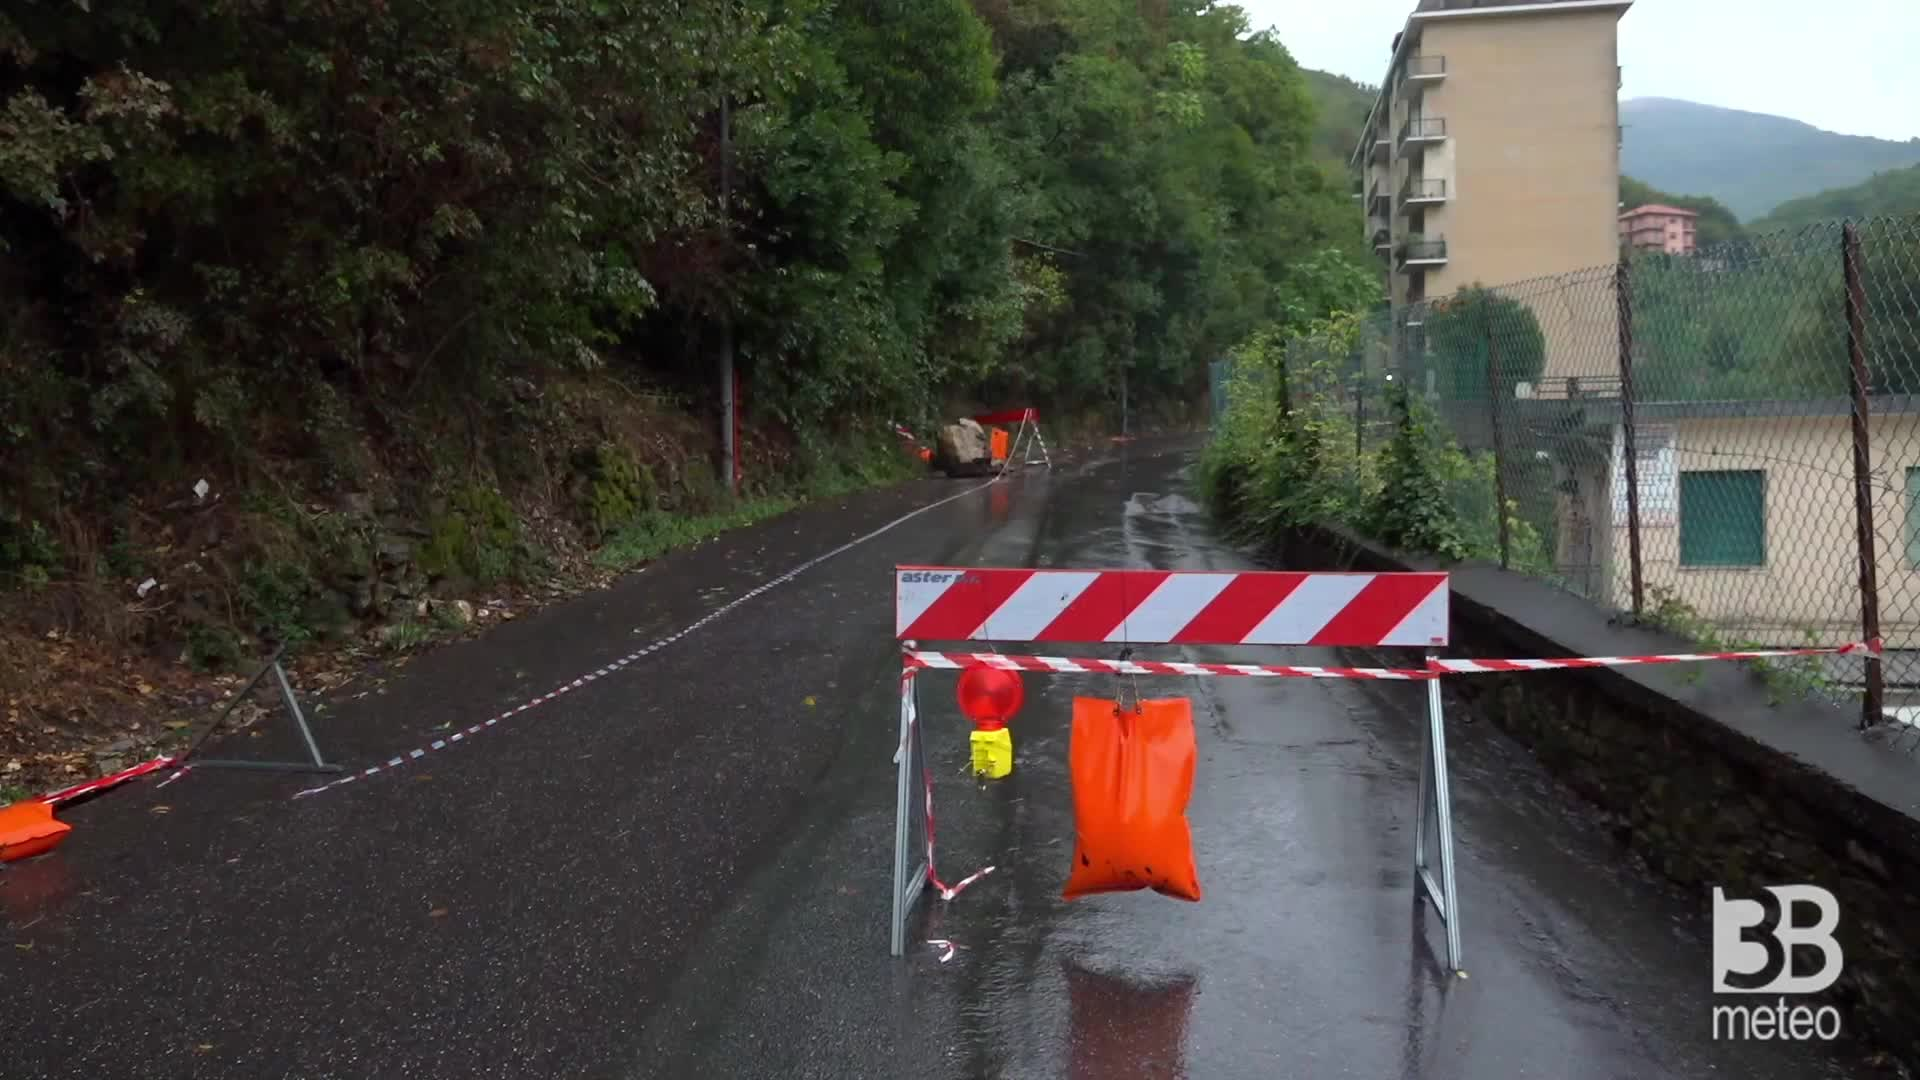 Genova, frana in Valbisagno: massi cadono su una strada